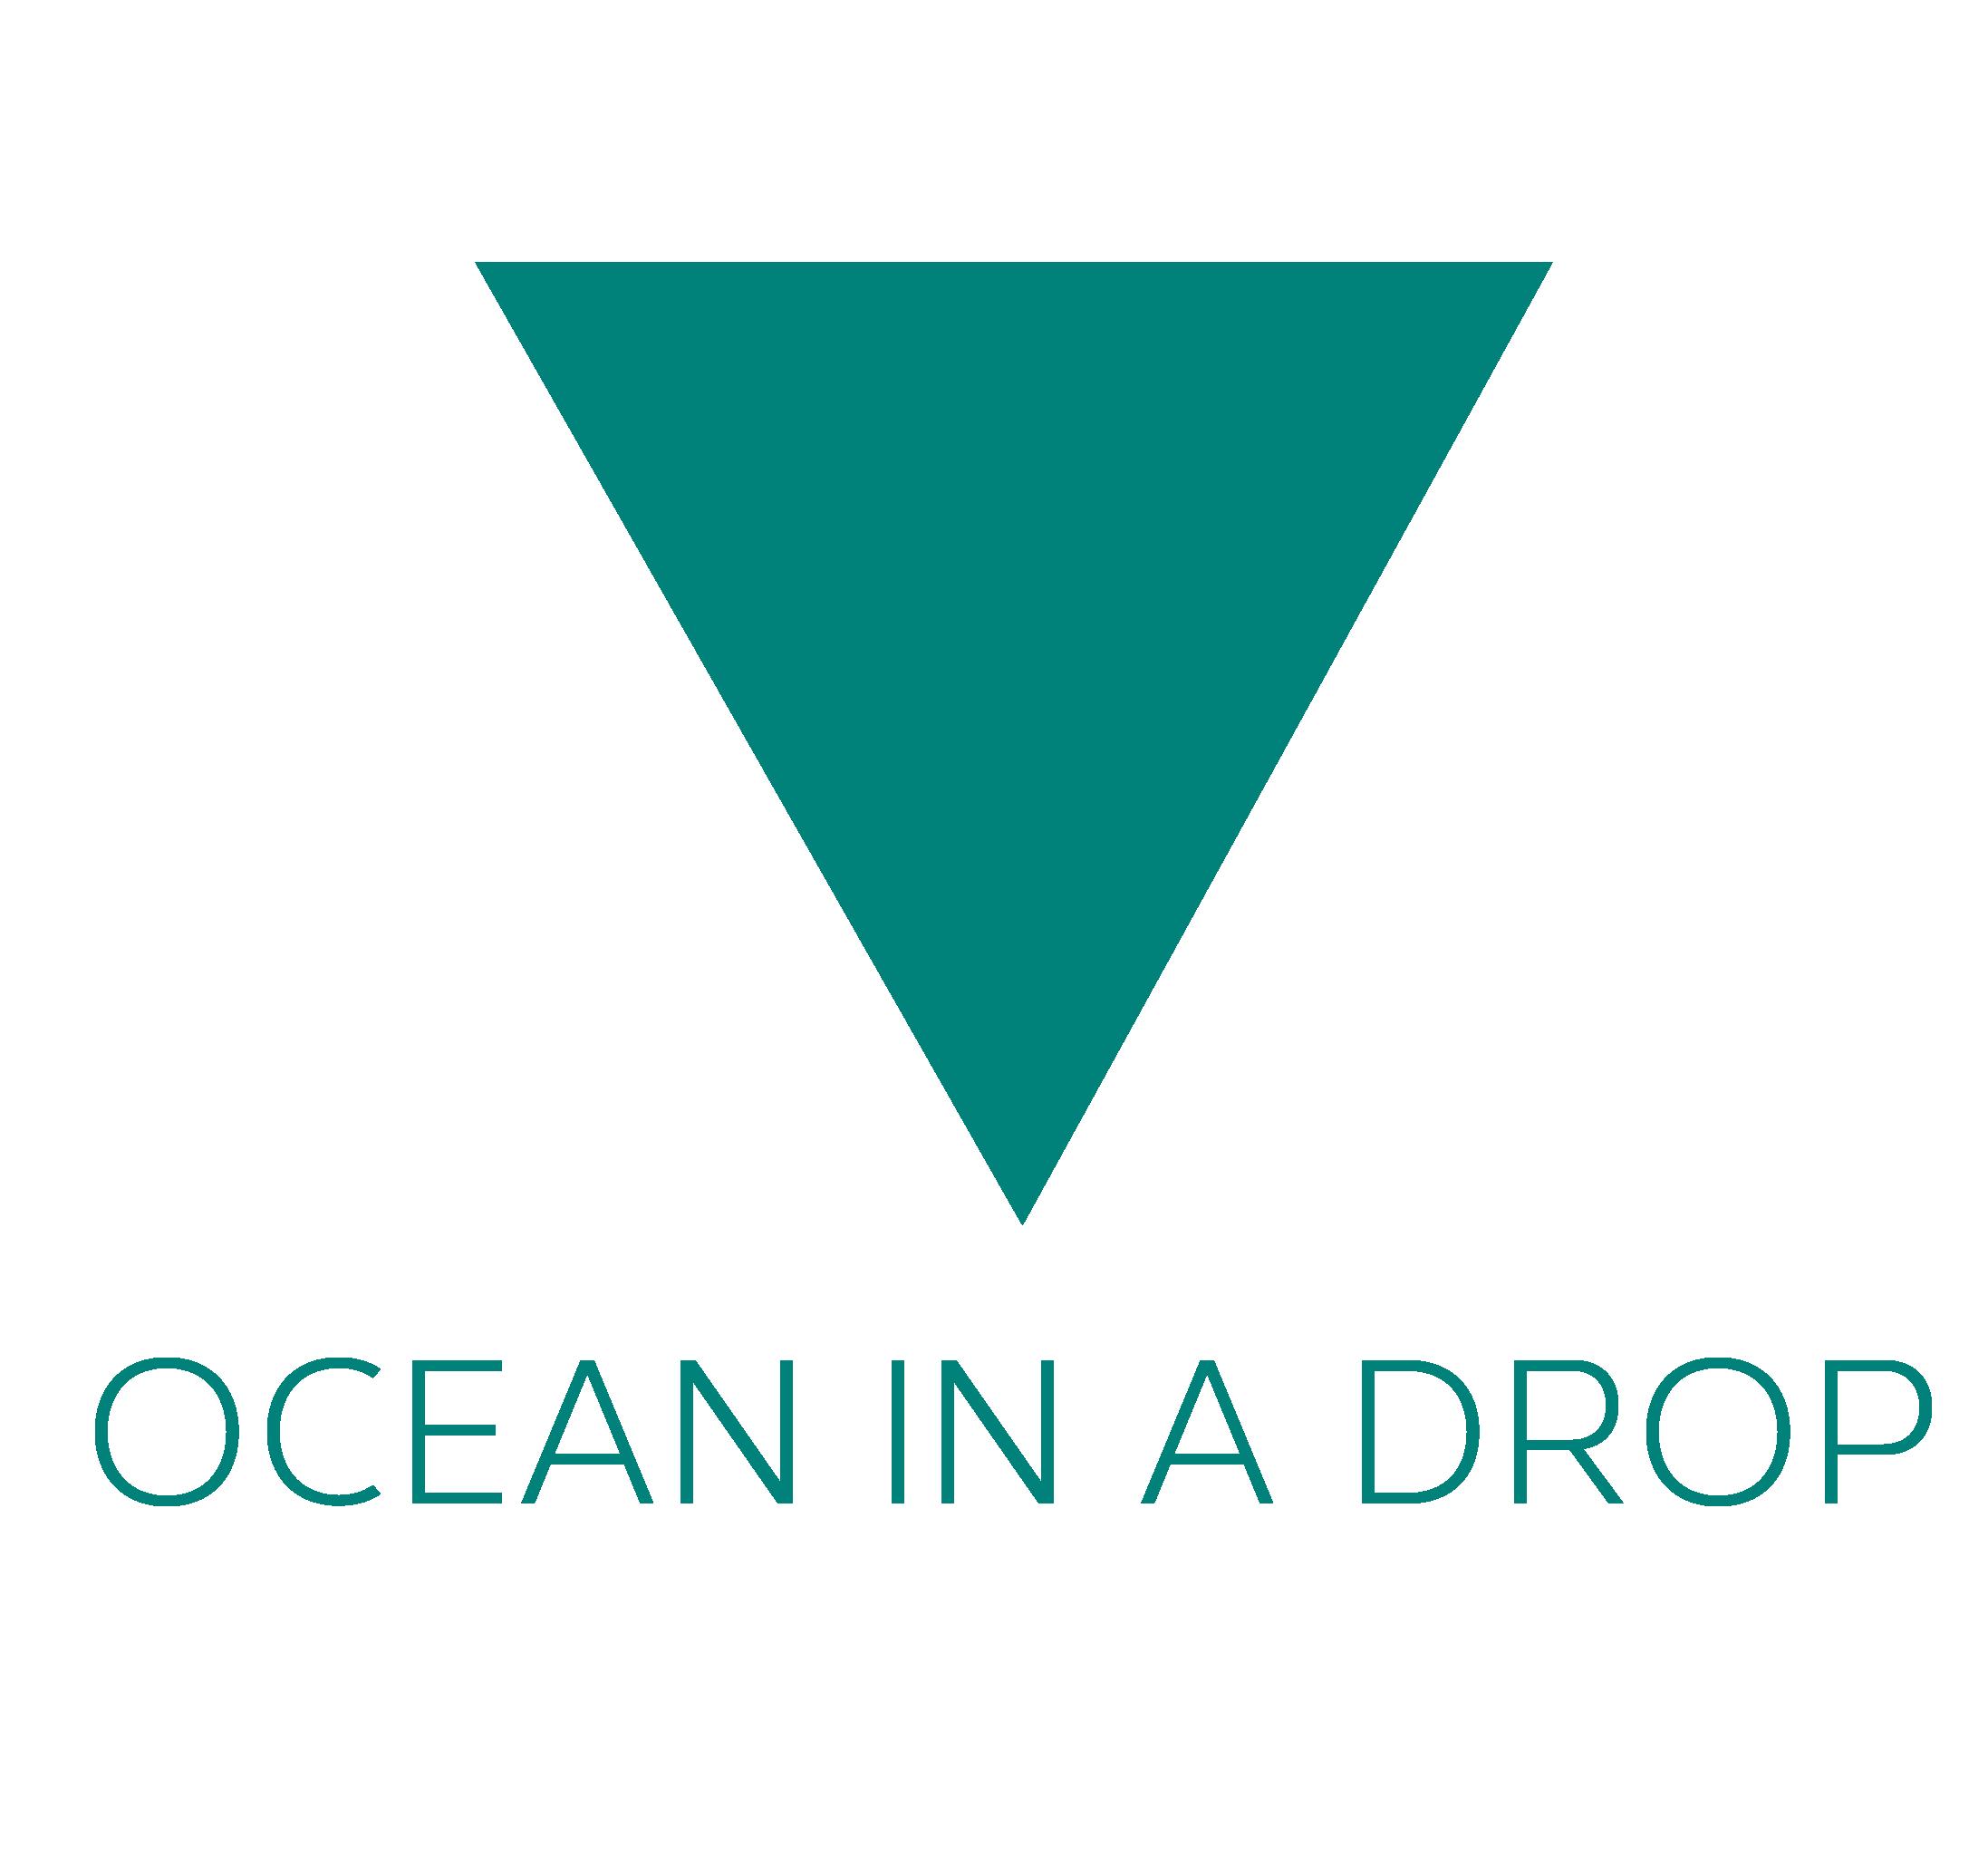 oceanlogo new-03 copy.png